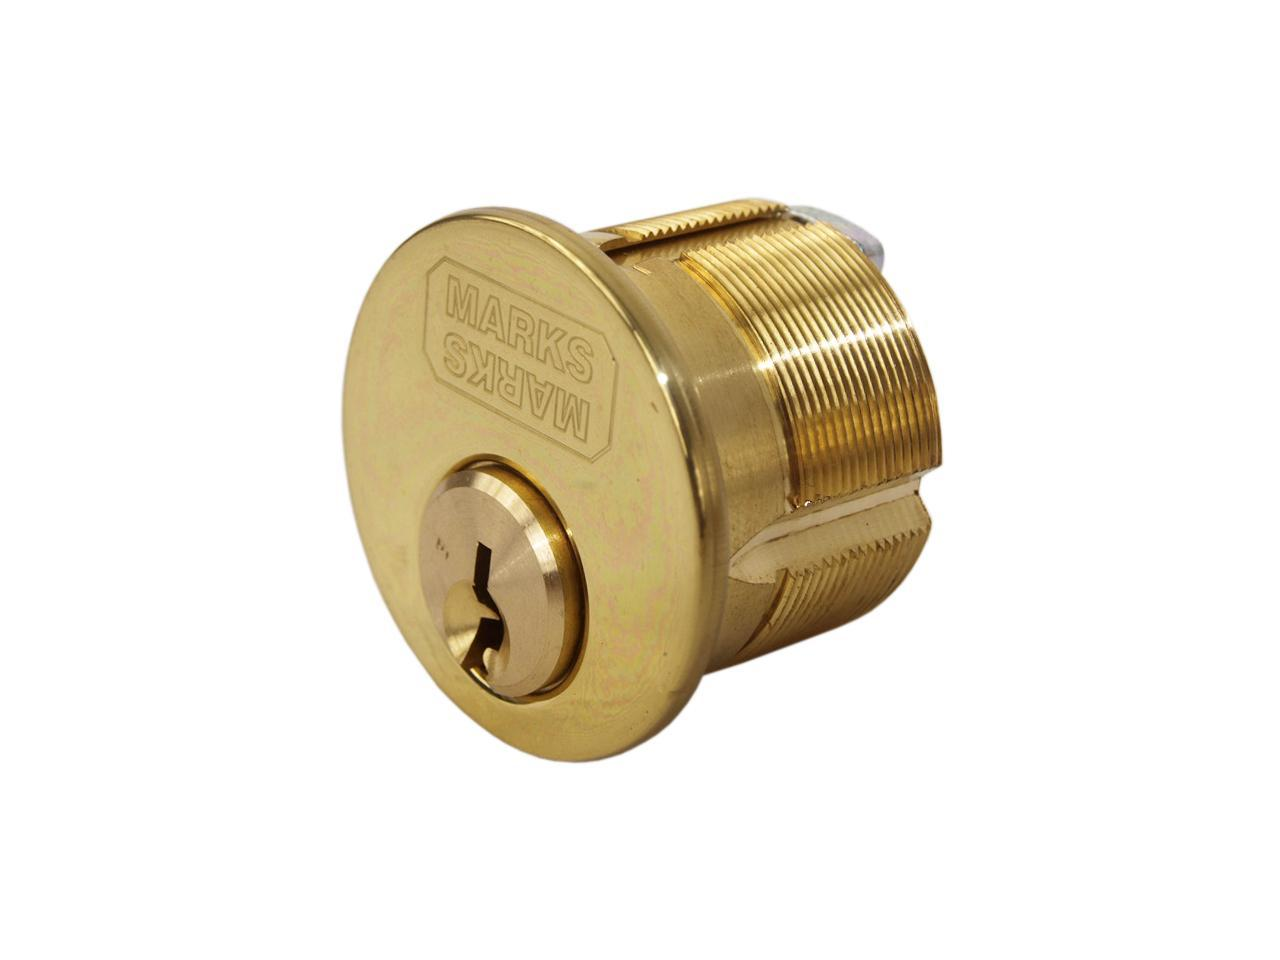 General Lock Mortise Thumbturn Cylinder Satin Chrome